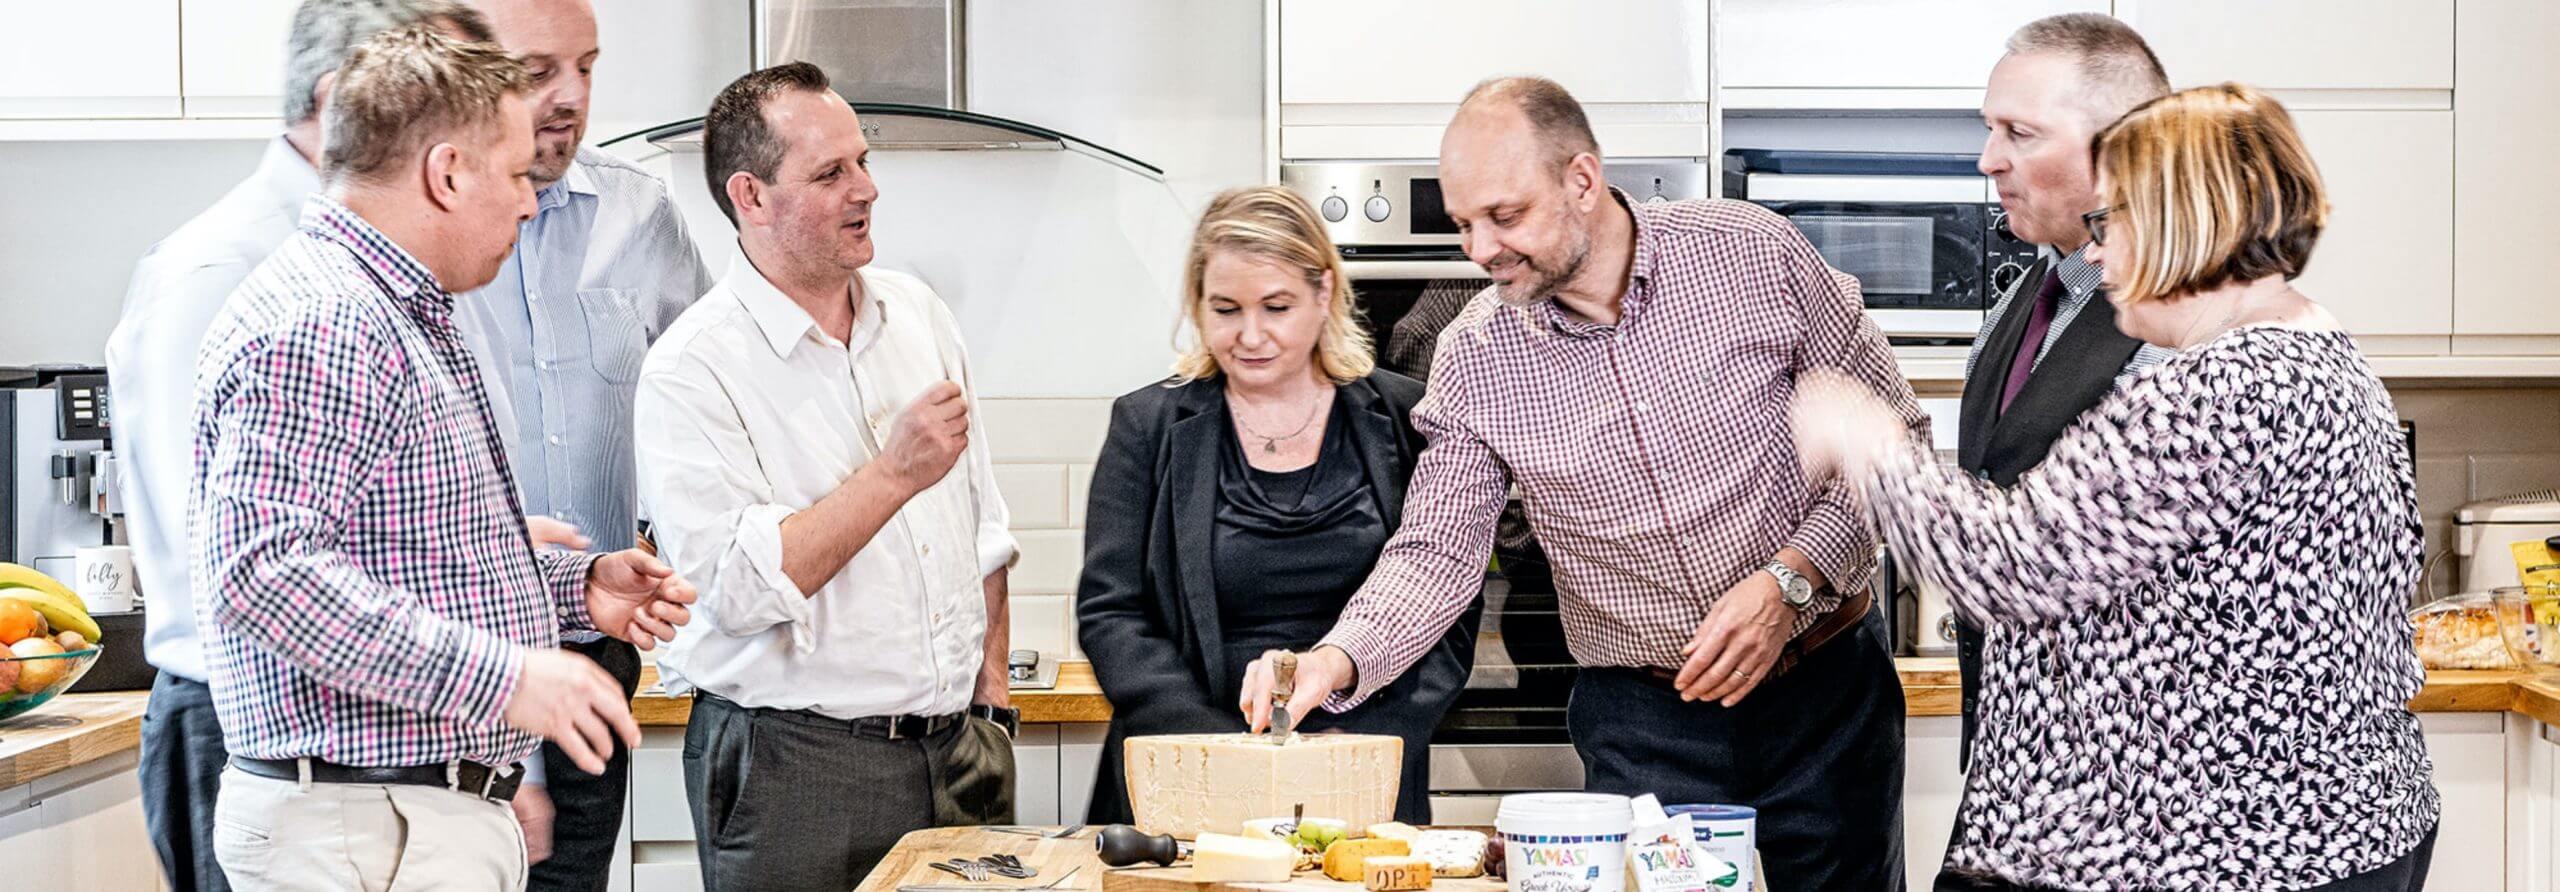 Futura Food Experts